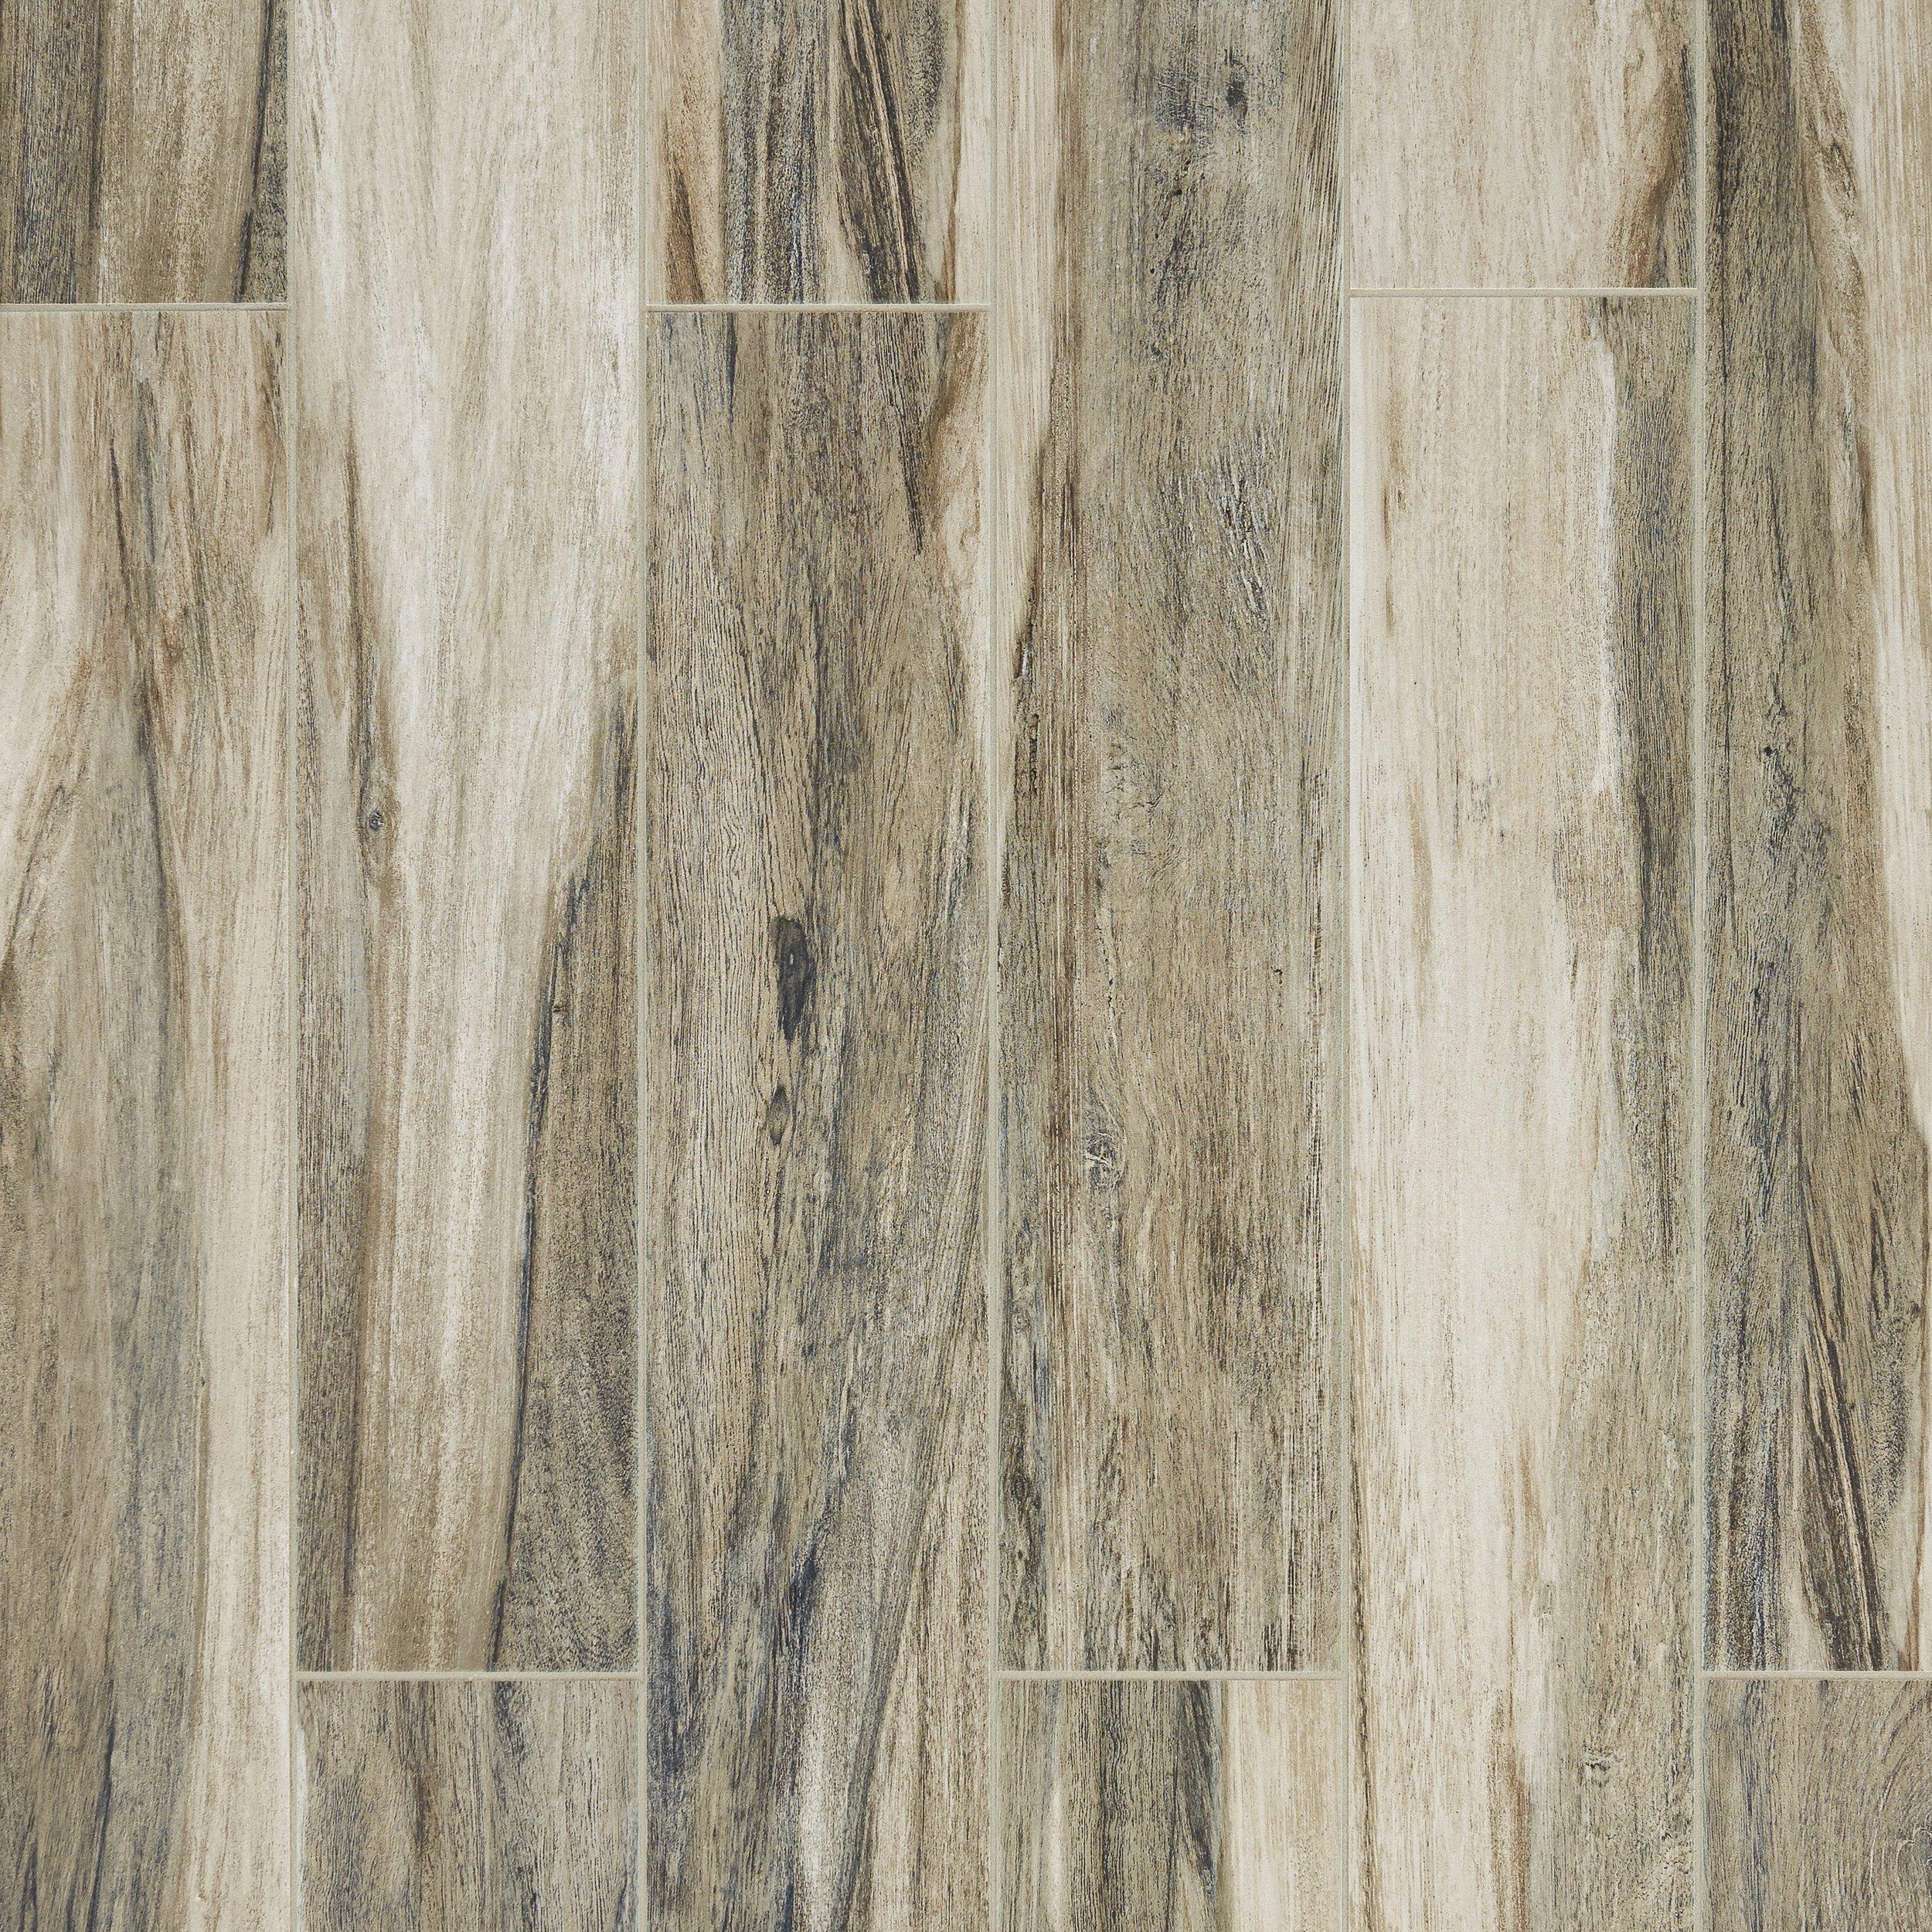 Wood Look Tile Floor Decor